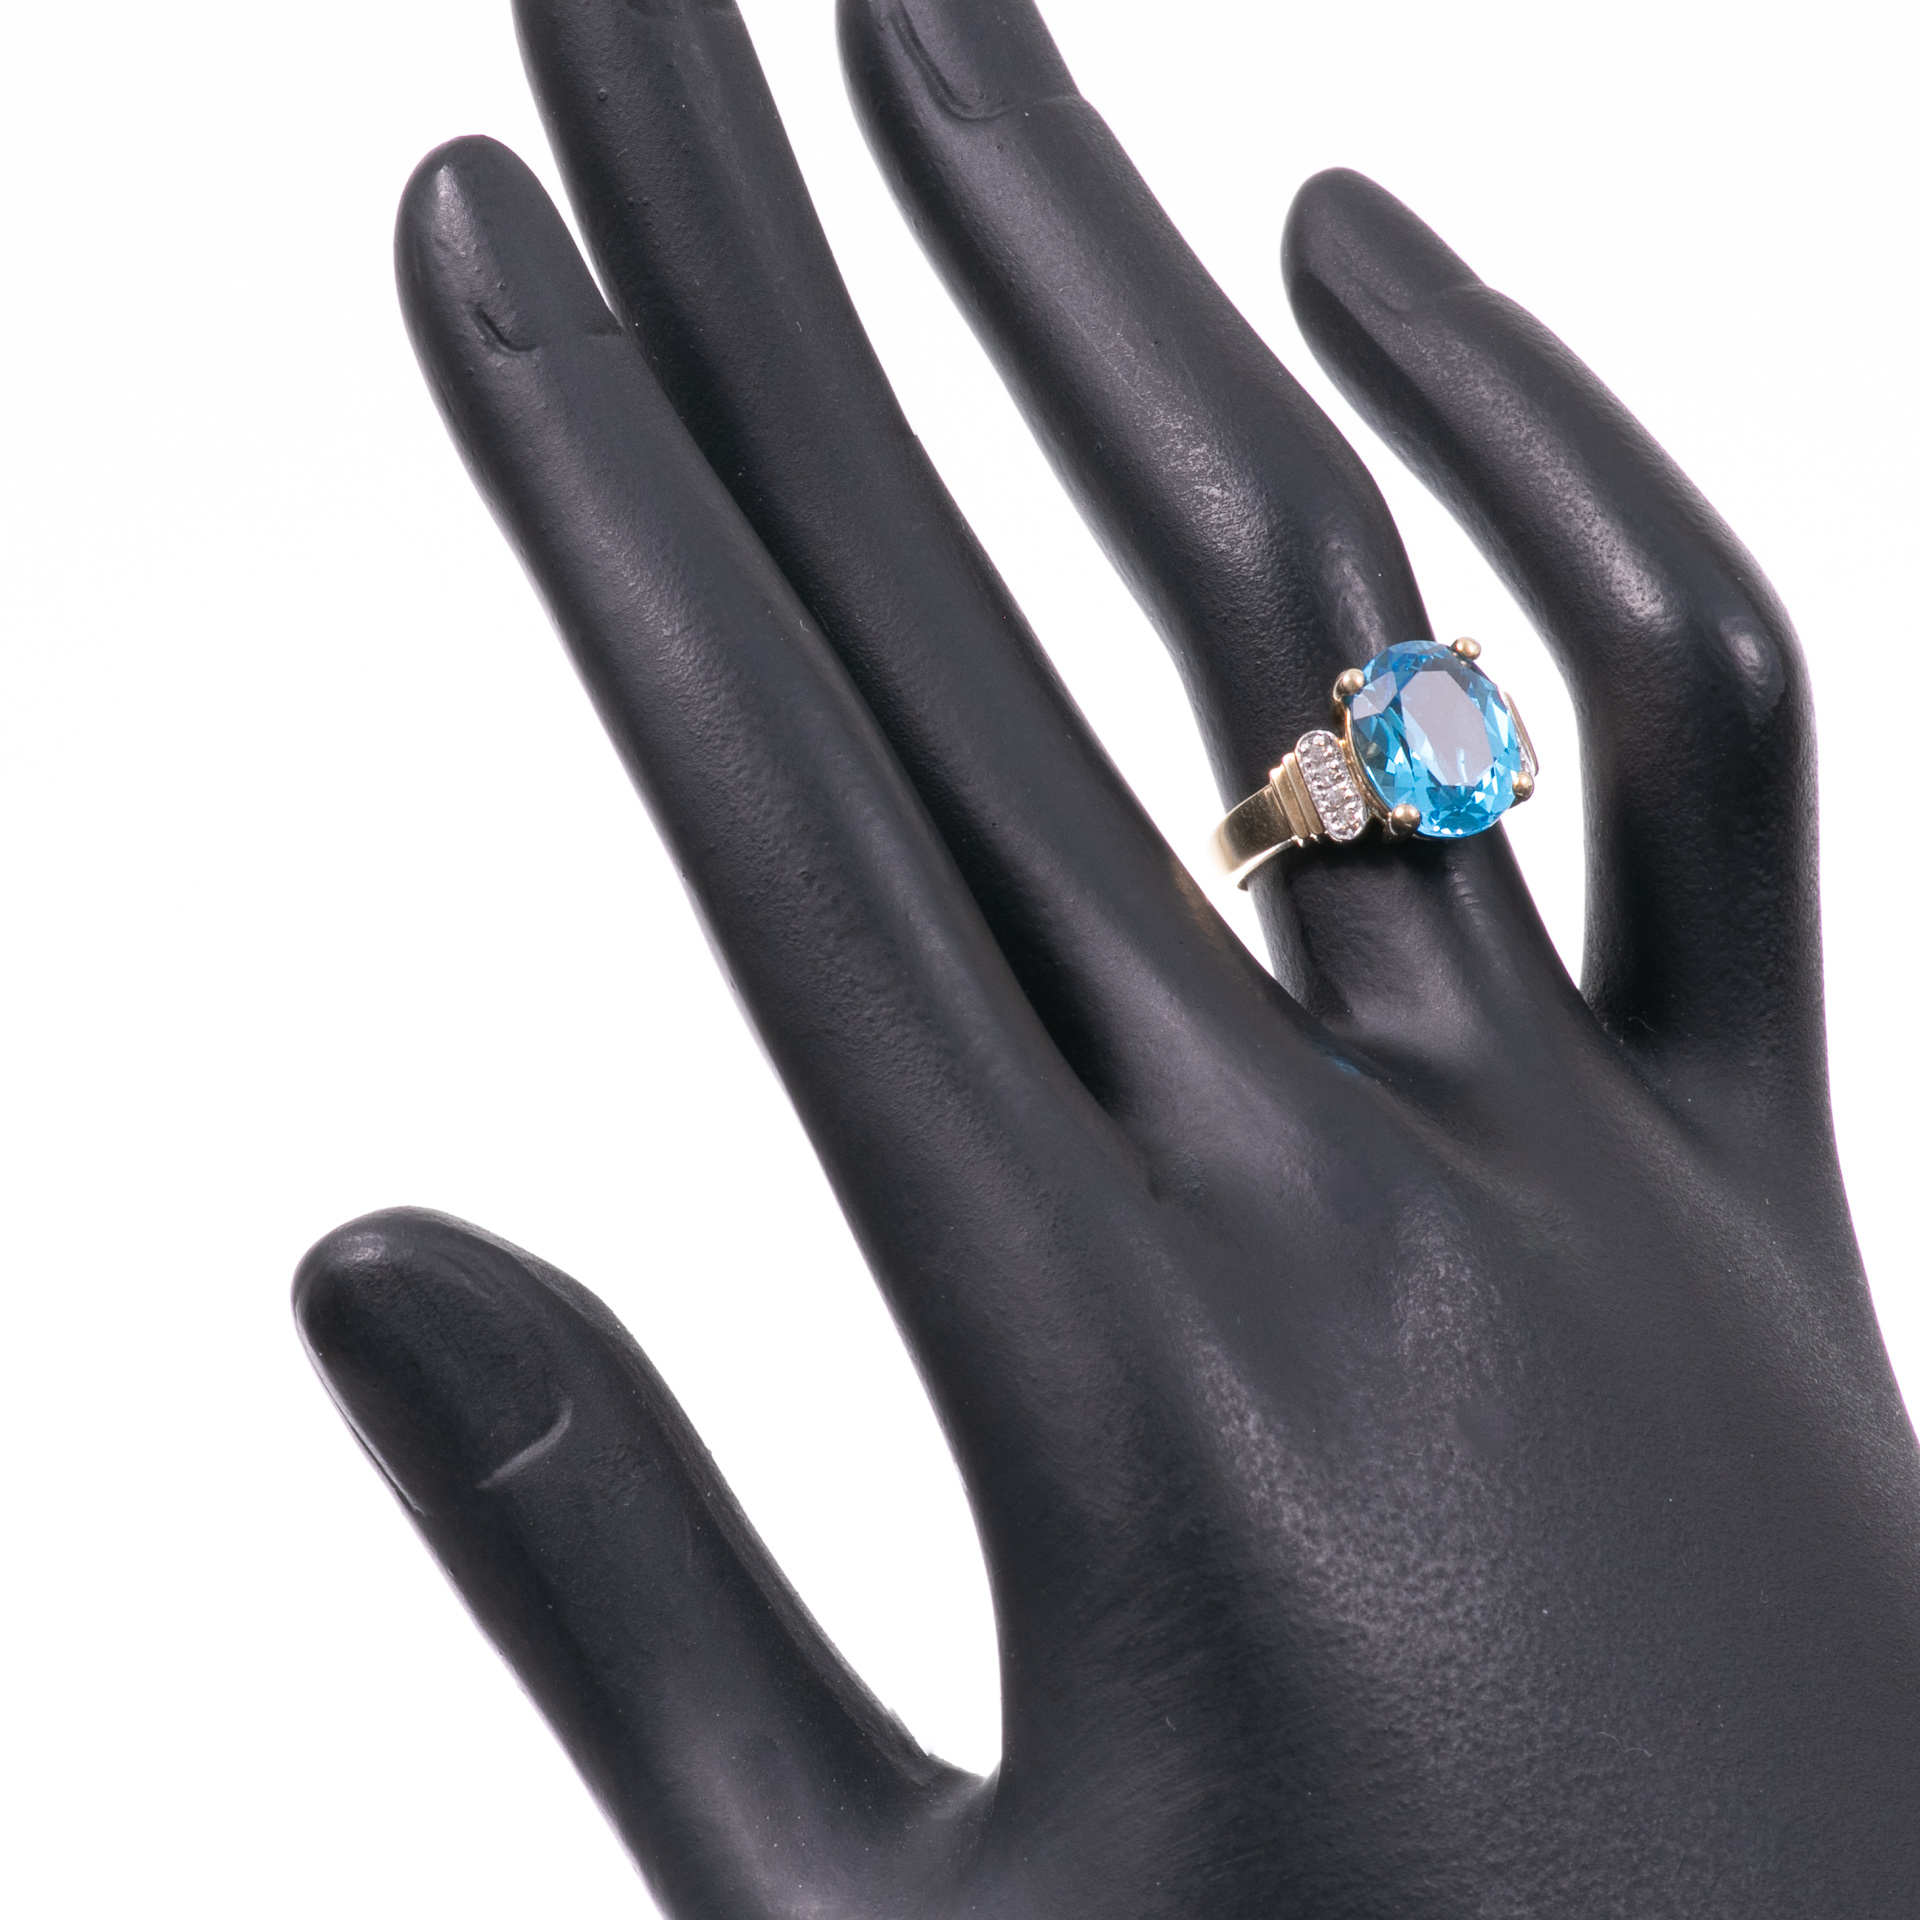 9ct Gold 4.40ct Blue Topaz & Diamond Ring - Image 2 of 6